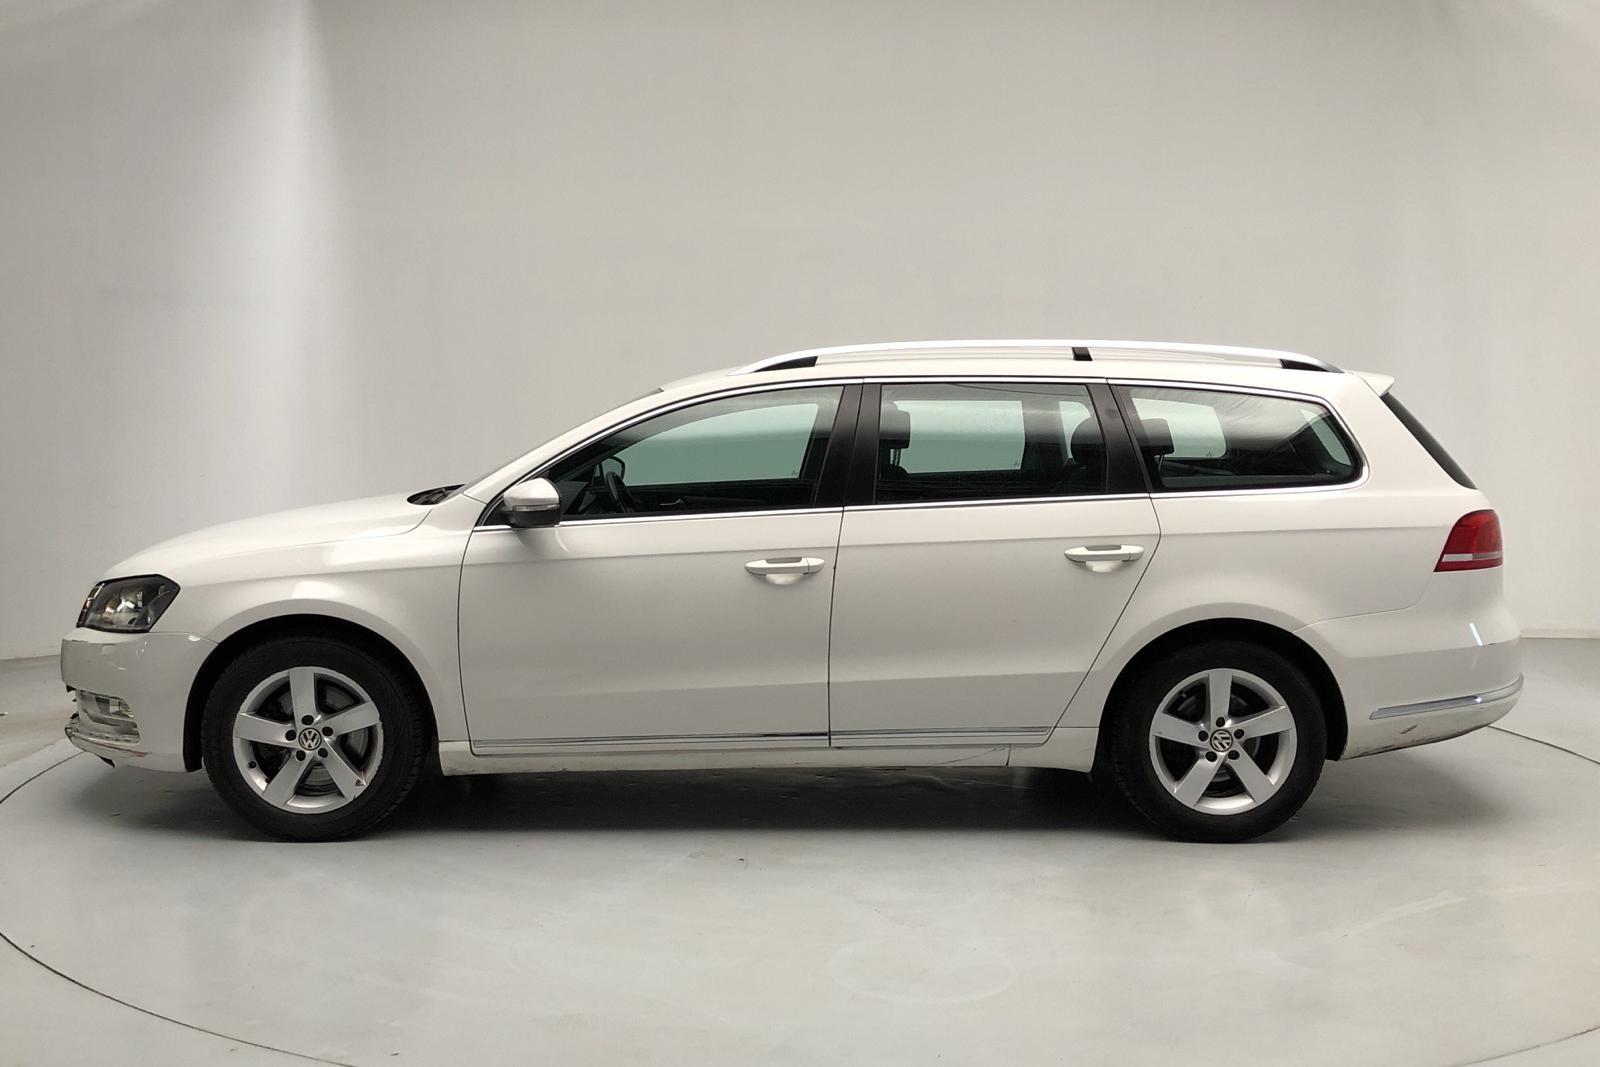 VW Passat 1.4 TSI EcoFuel Variant (150hk) - 0 km - Automatic - white - 2015